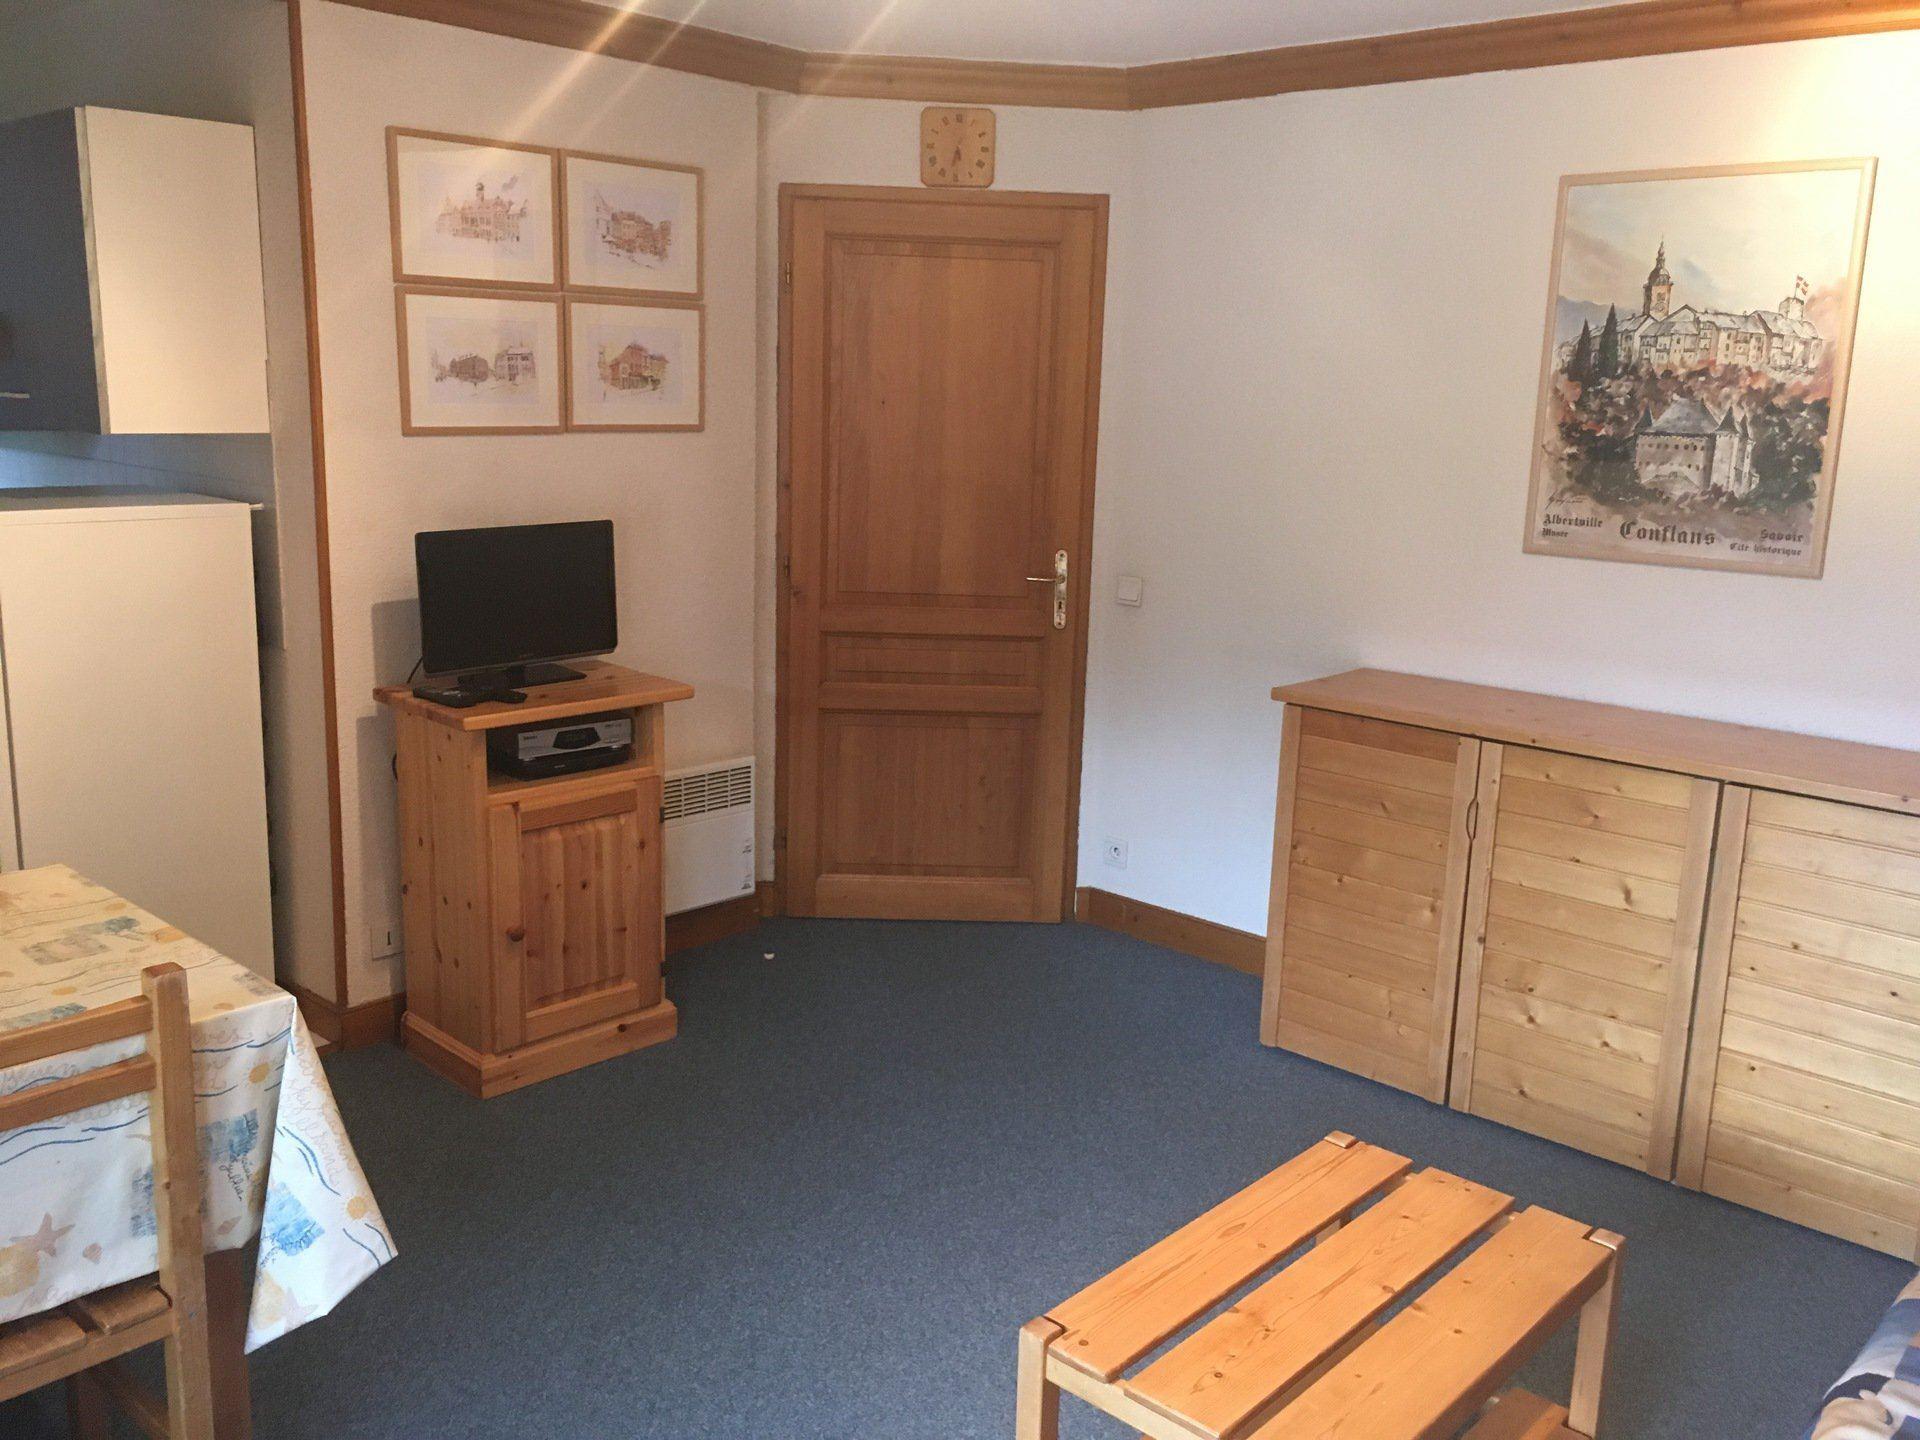 2 Rooms cabin 6 Pers ski-in ski-out / BALCONS DE TOUGNETTE 24